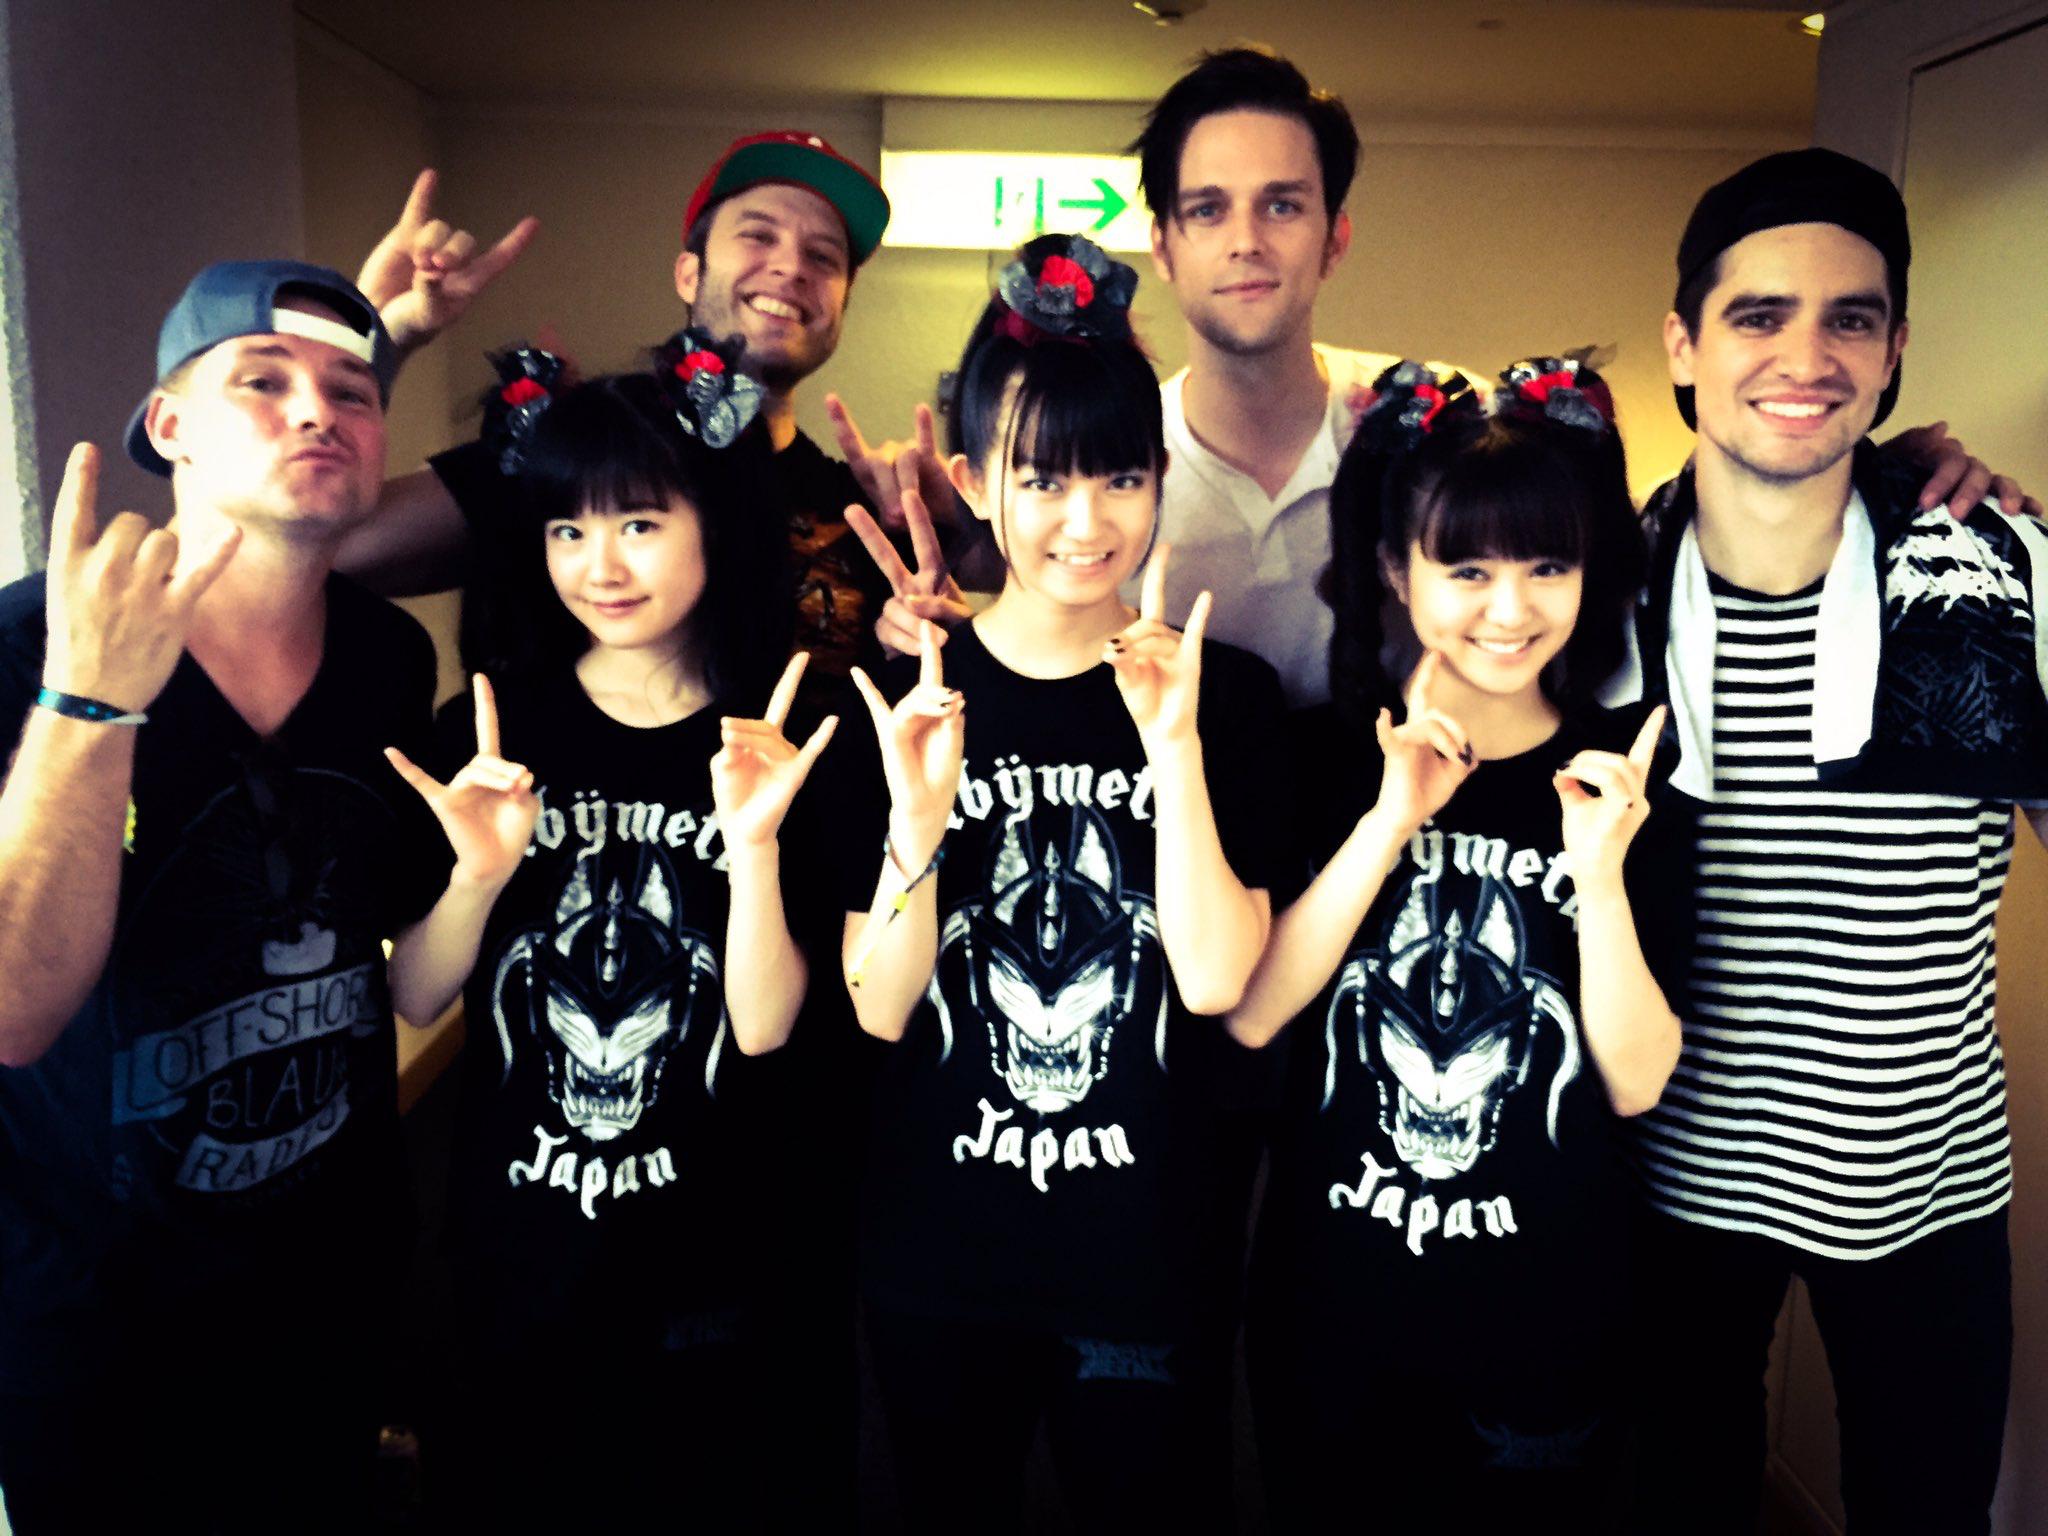 Thank you #サマソニ! 本日22:00から#TOKYODOME公演オフィシャルHP先着先行受付中DEATH!!bit.ly/2bohFxZ #summersonic #東京ドーム  #BABYMETAL